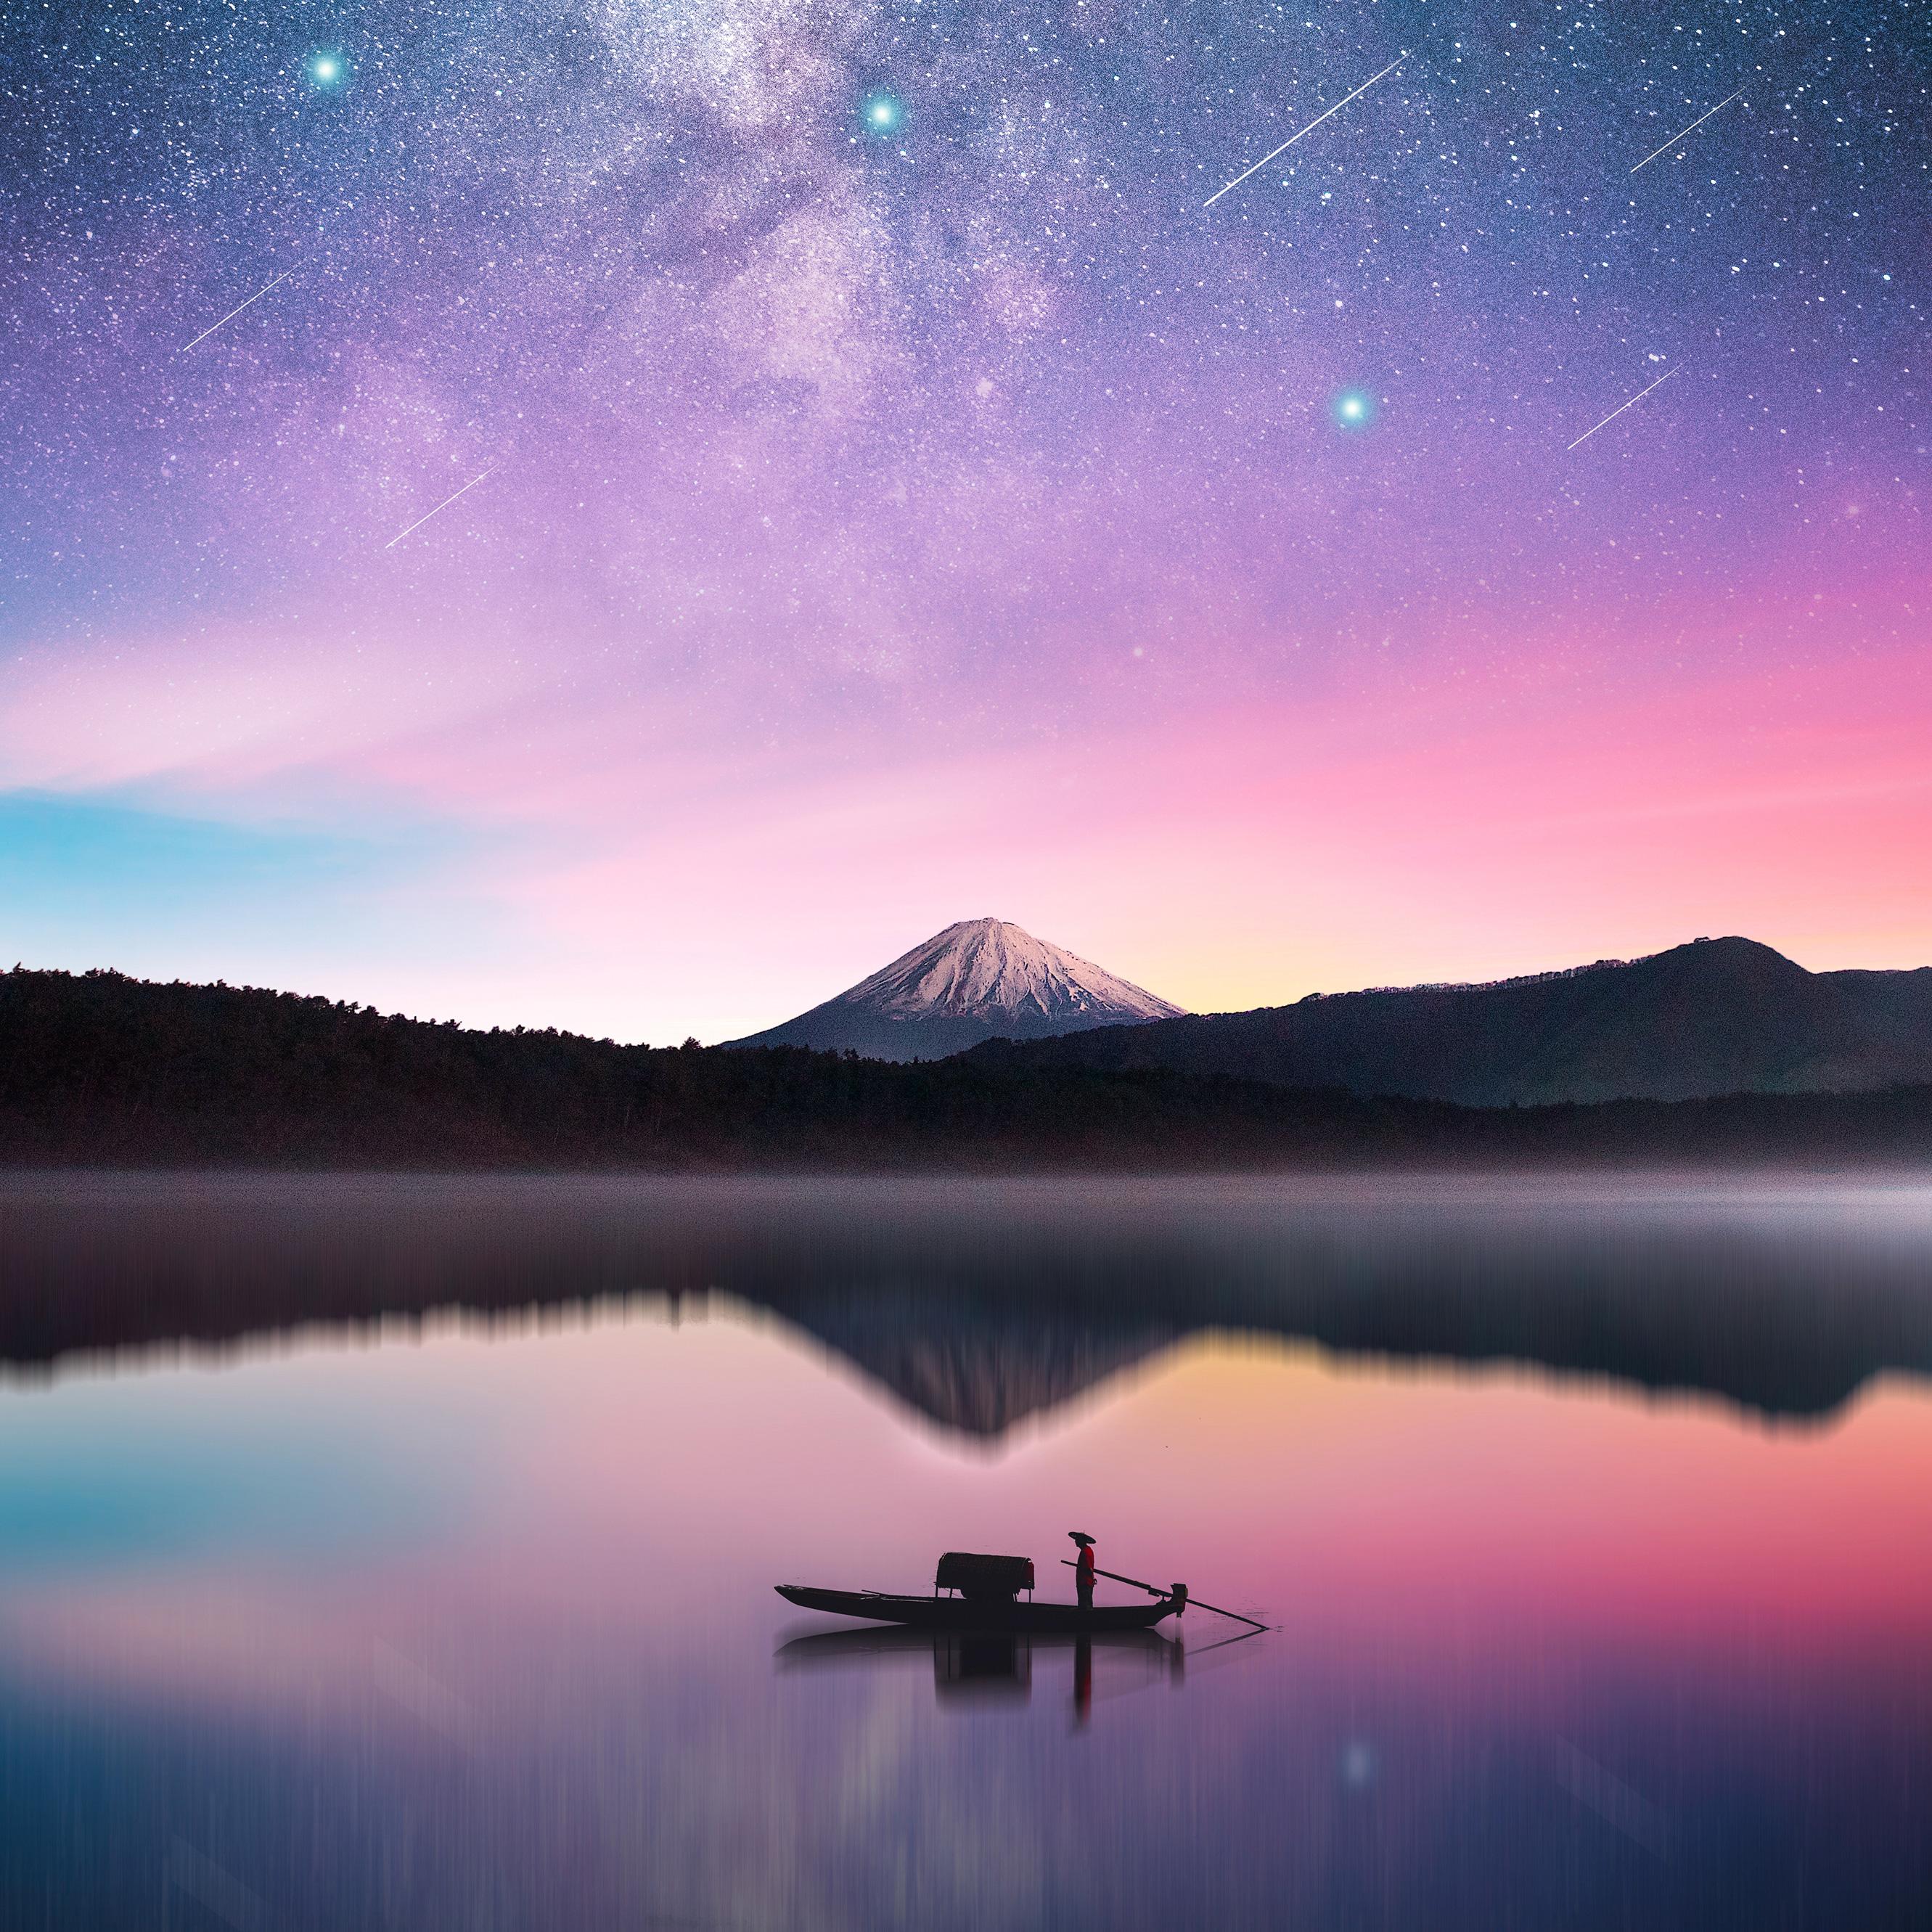 4k Resolution Wallpaper: 3840x2160 Milky Way Mount Fuji 4k HD 4k Wallpapers, Images